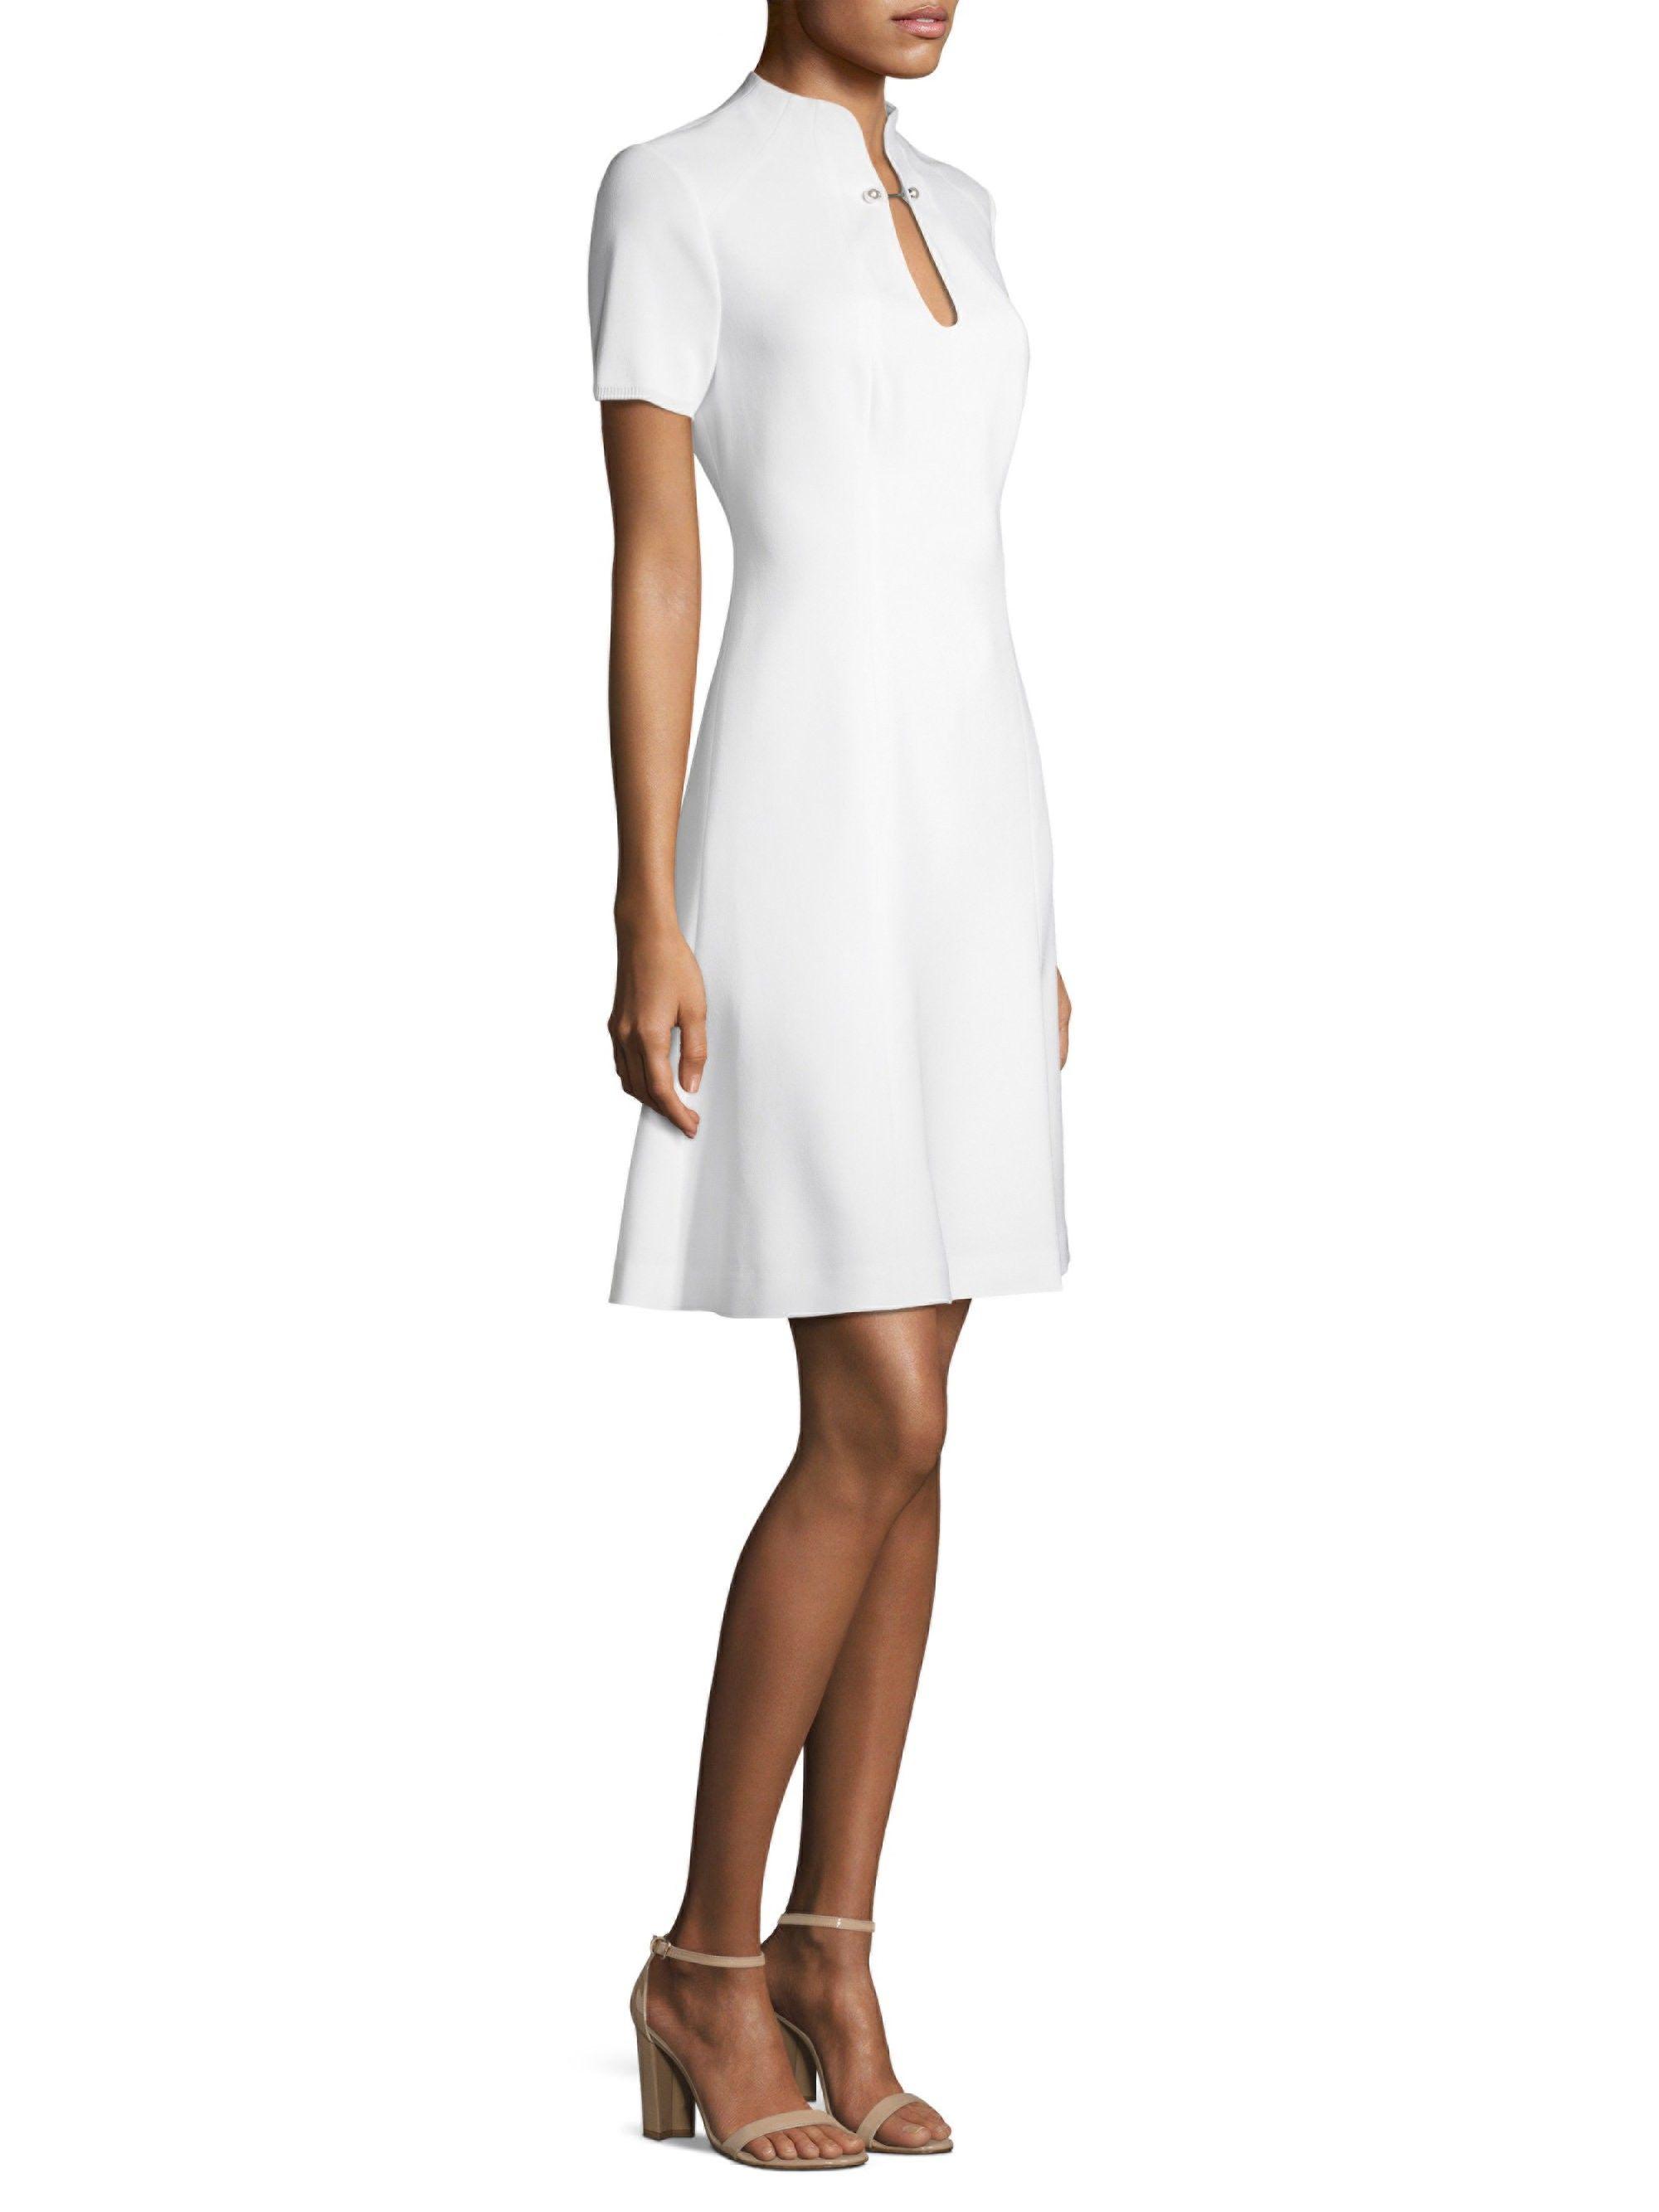 da35a7c6078e Elie Tahari Yuki Hardware Splitneck Flare Dress - Optic White 8 ...